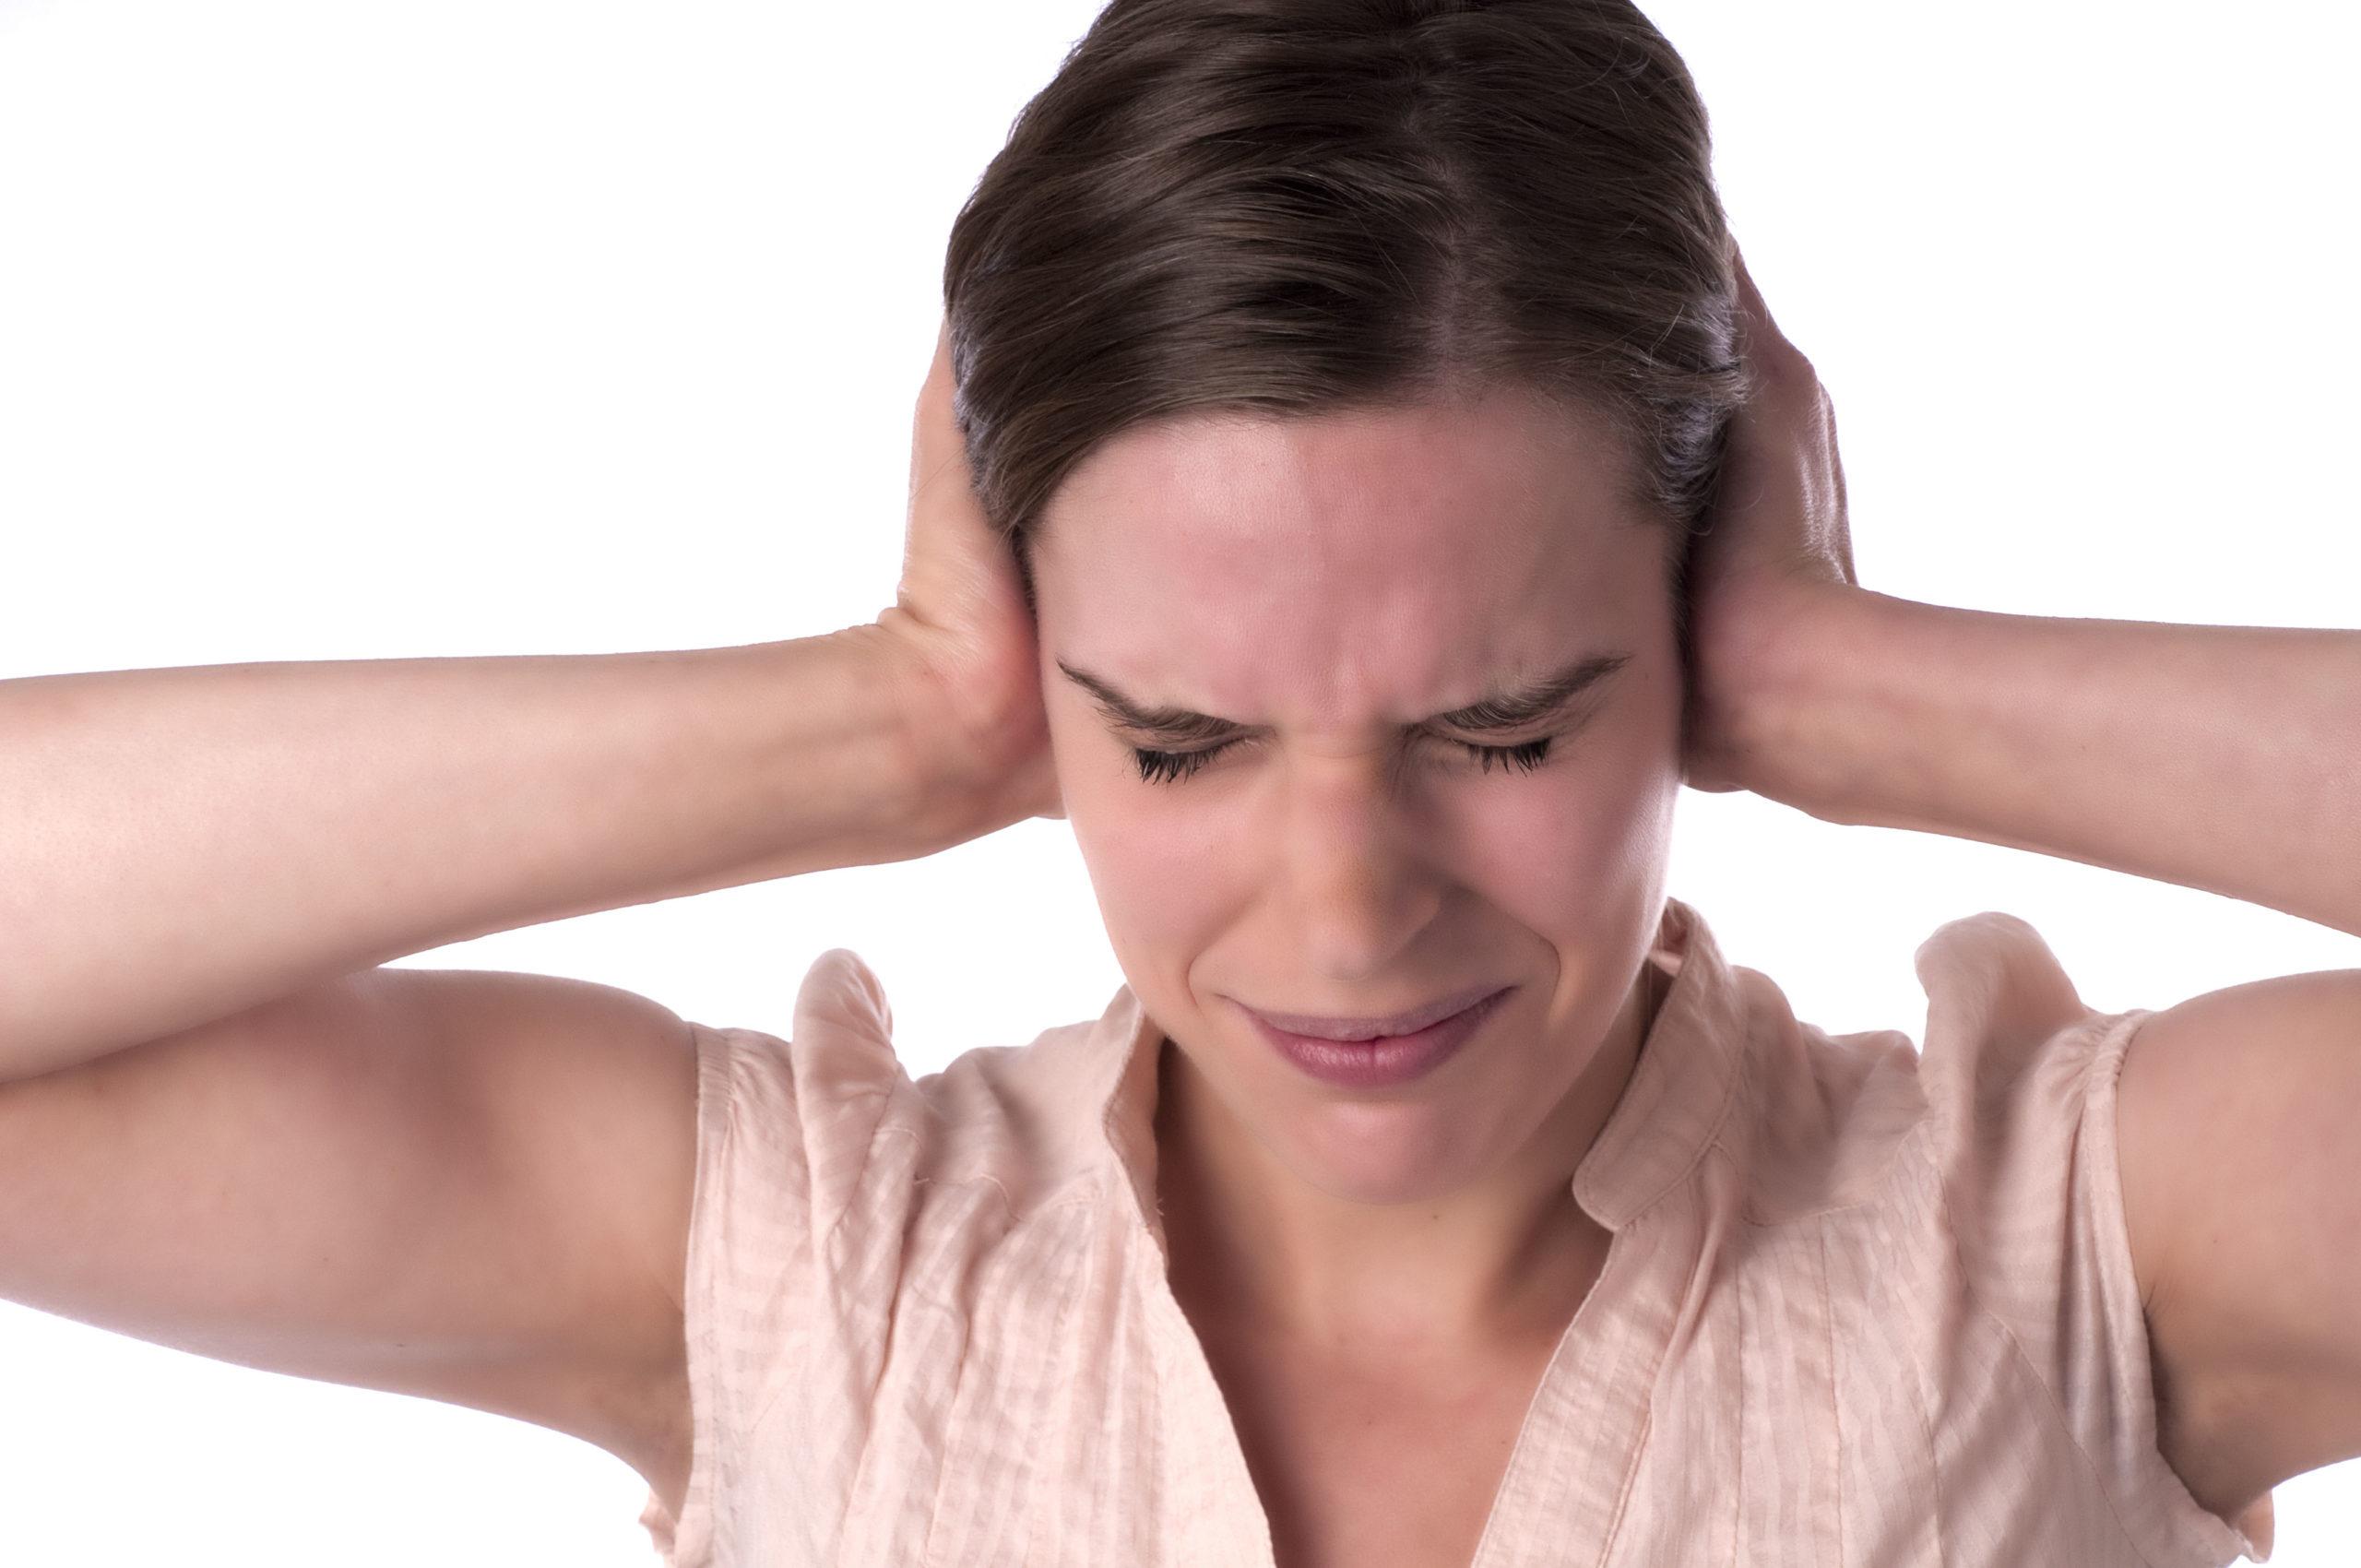 Lärm kann krank machen